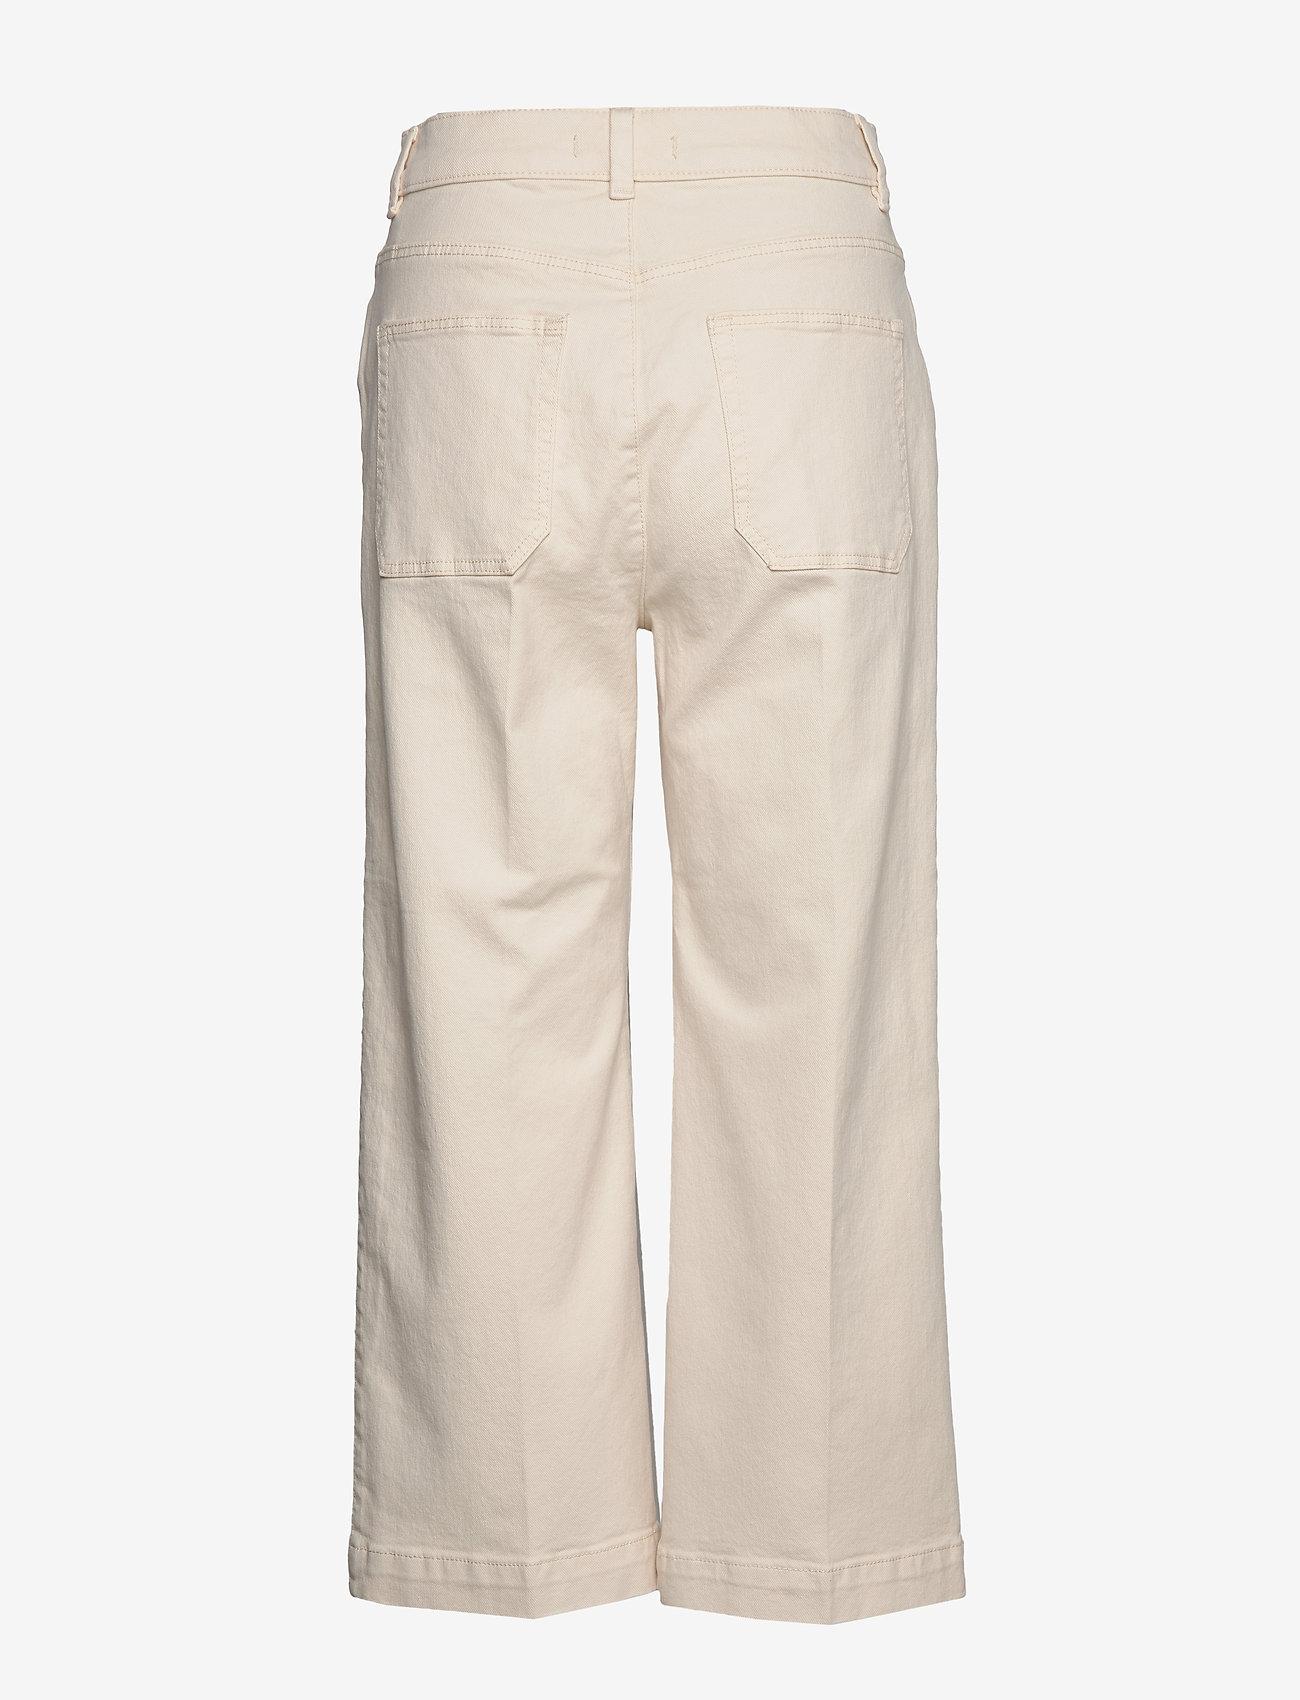 Esprit Casual - Pants woven - vide bukser - ice - 1